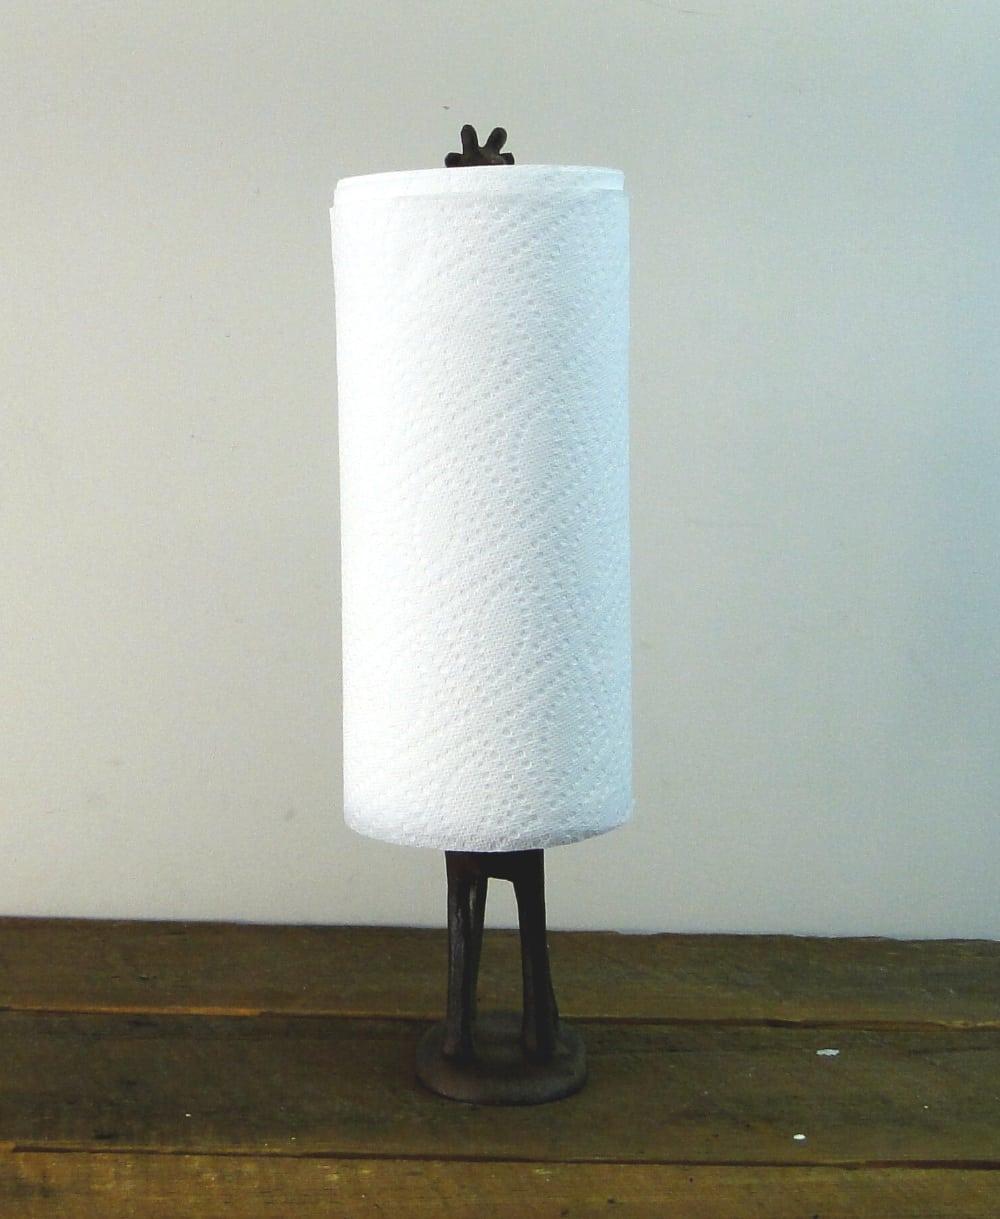 Giraffe Toilet Paper Towel Holder Rust Cast Iron - The Kings Bay